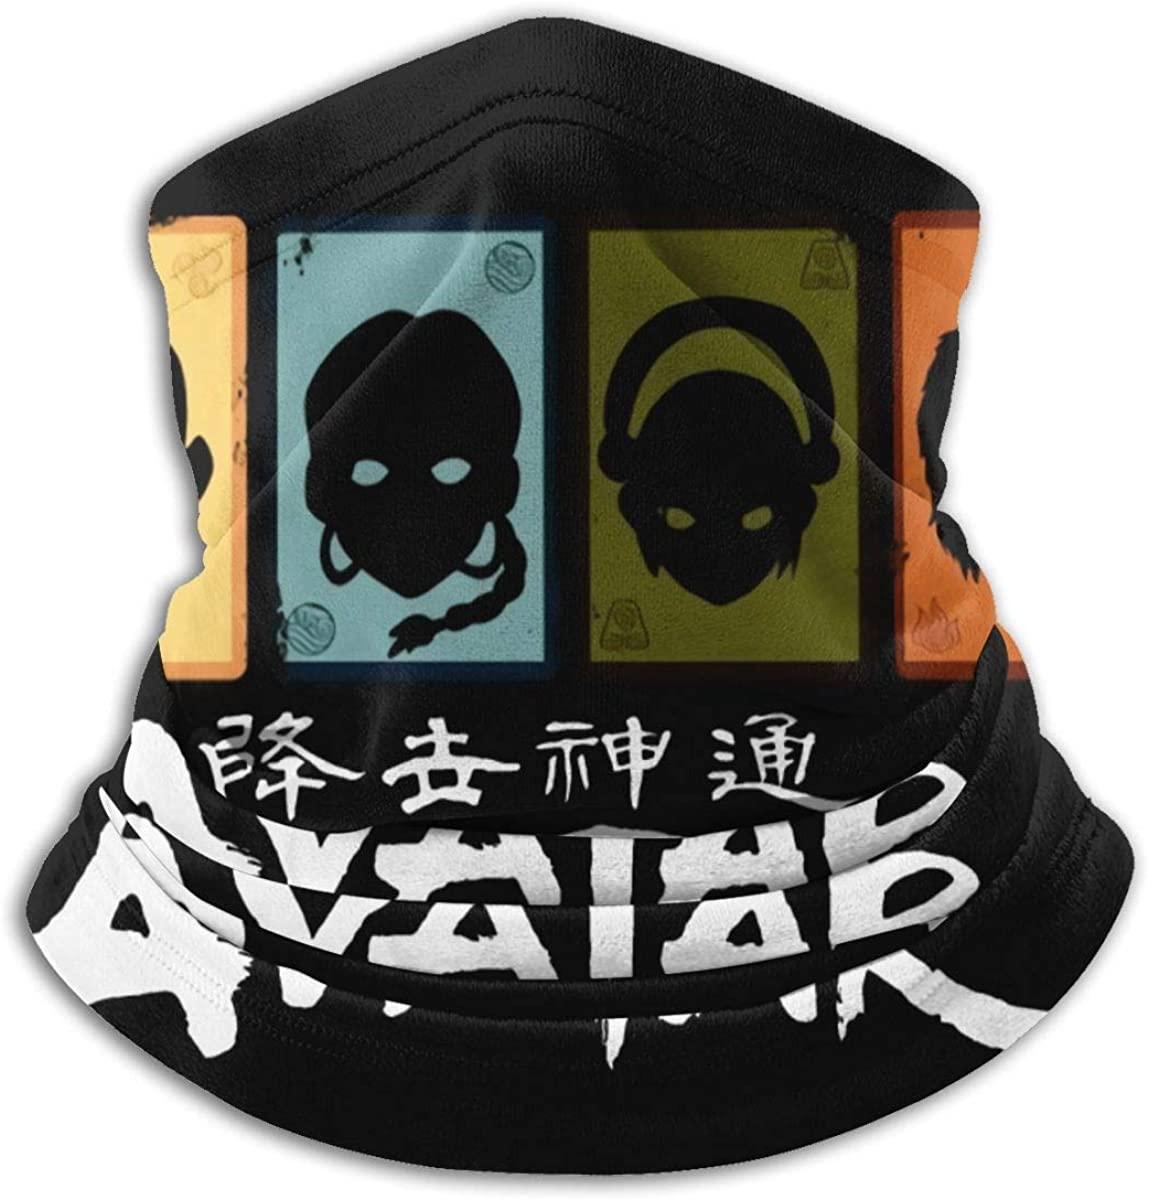 Avatar The Last Airbender Neck Warmer Neck Gaiters Warm Novelty Bandana Face Mask Neck Scarf For Men & Women